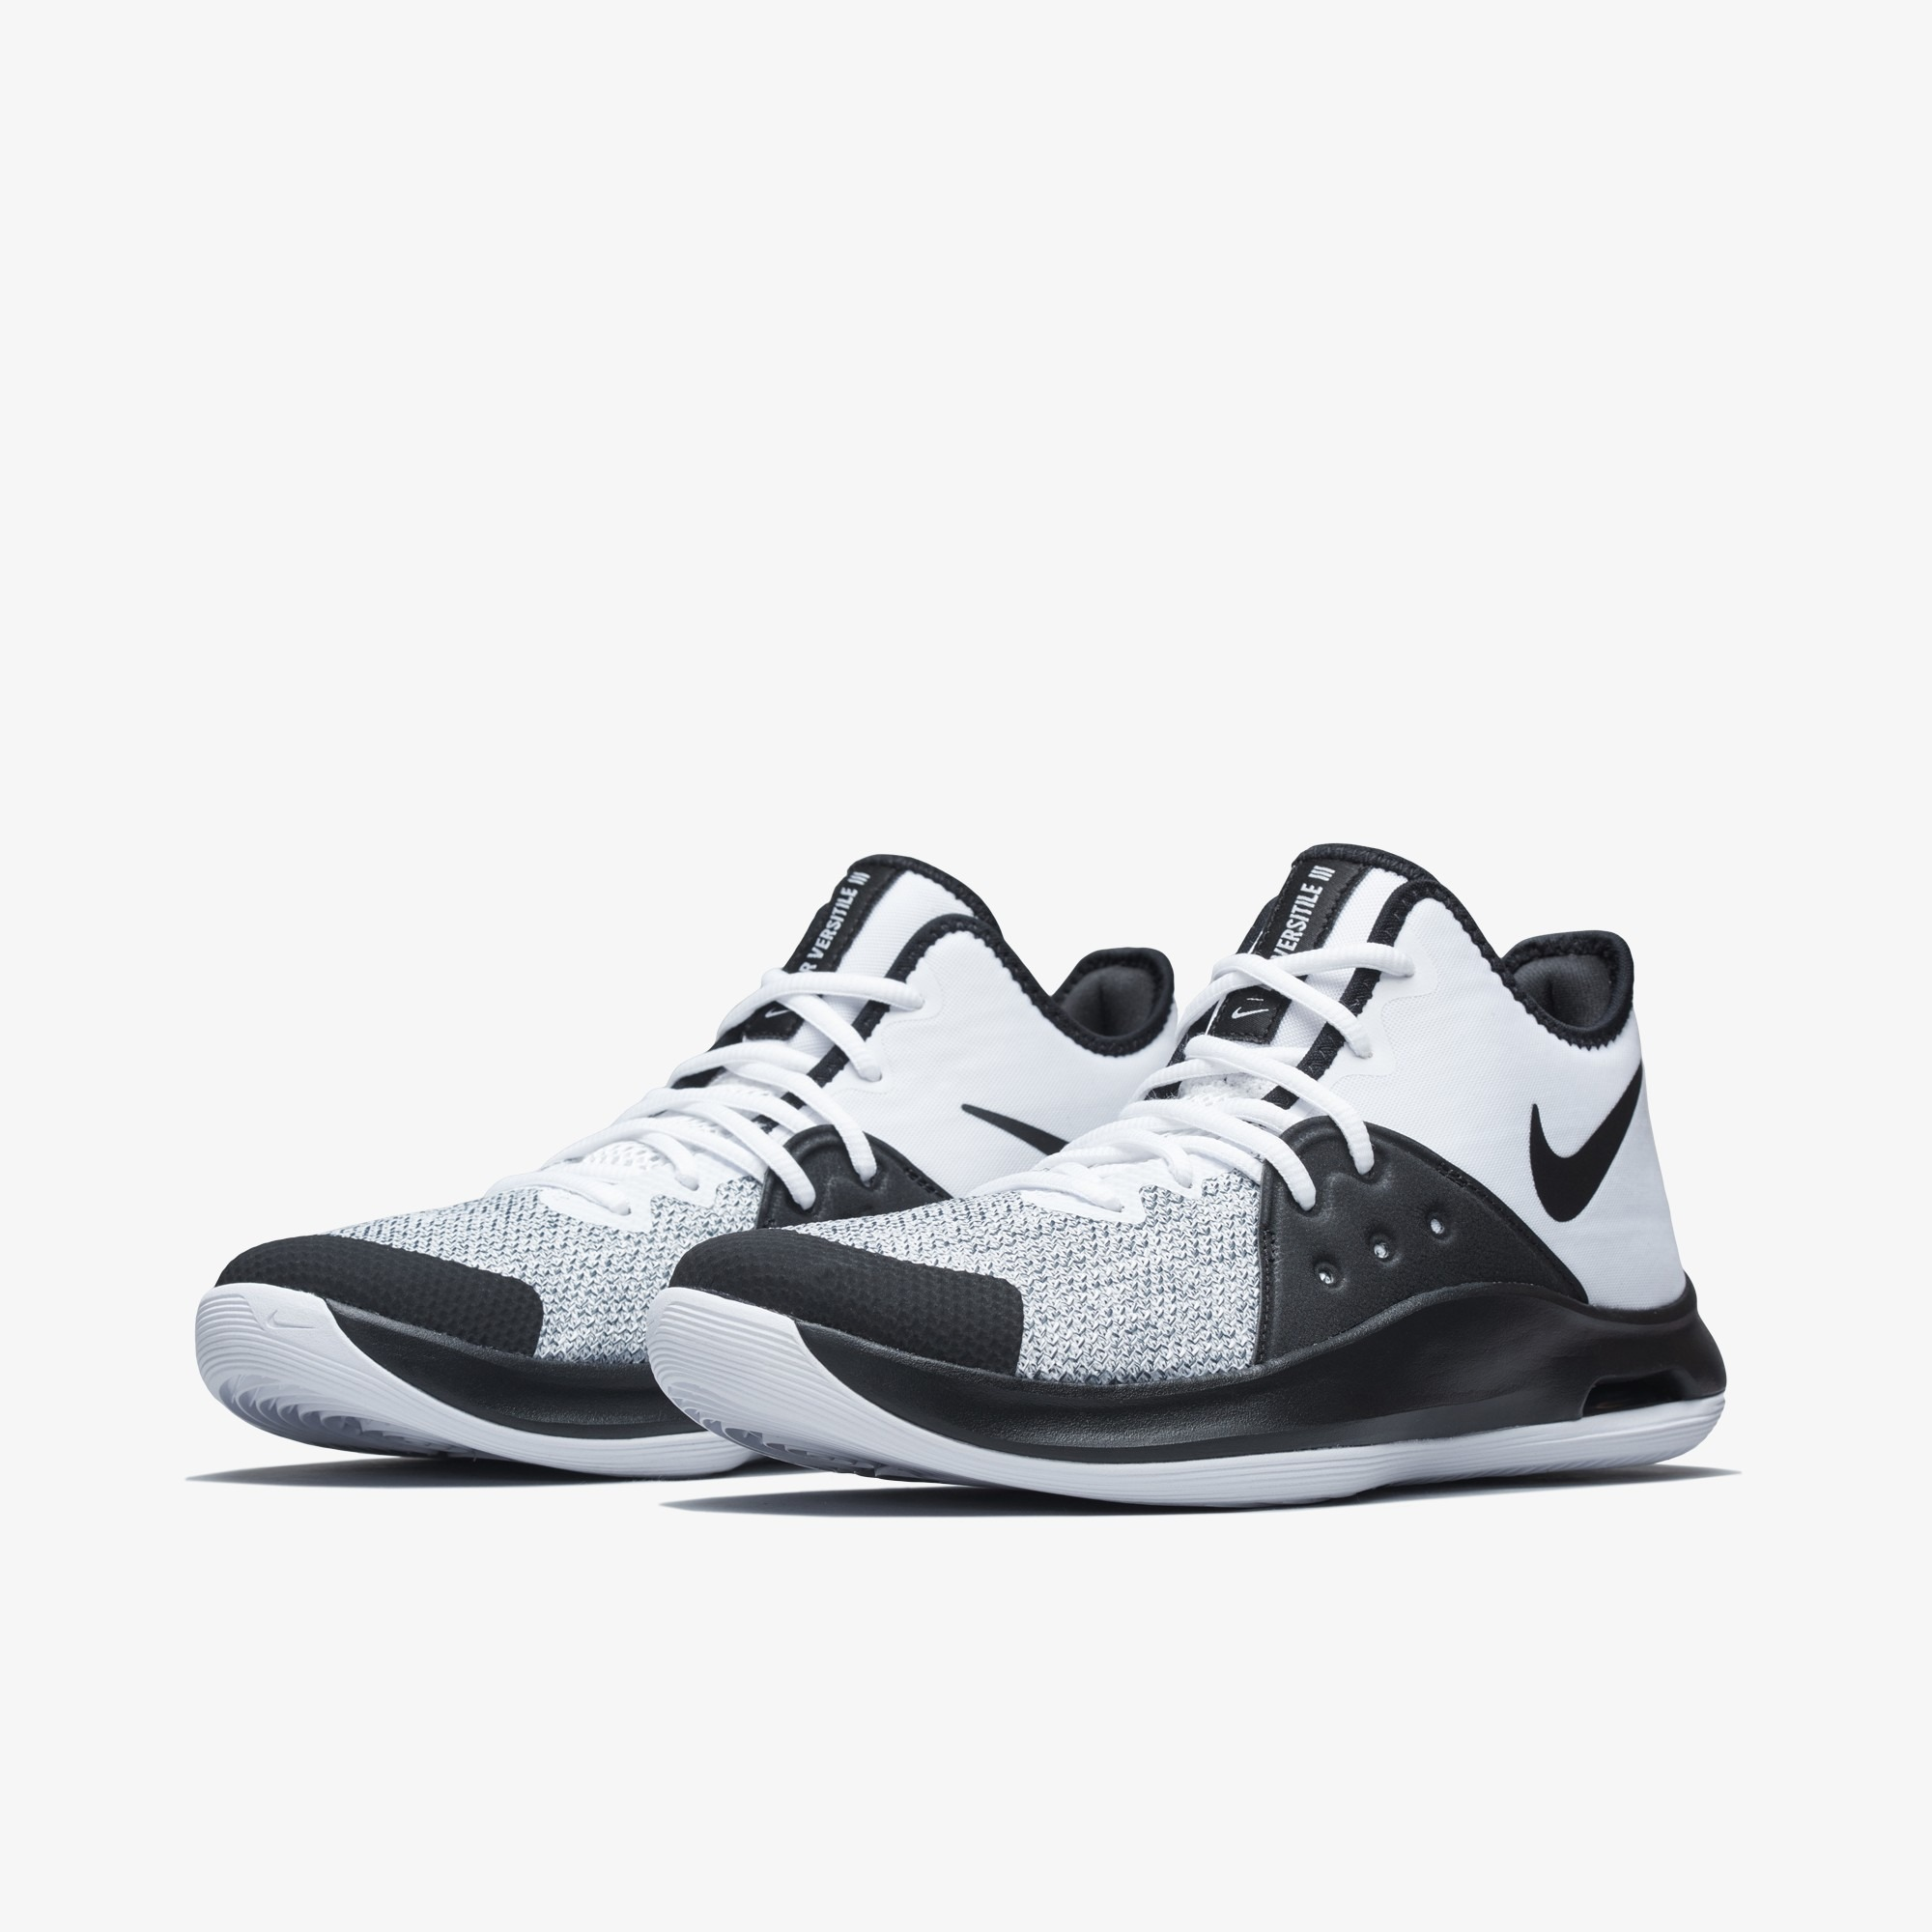 f46b744fc8a0 Nike Air Versitile III Basketball Shoes - BASKETBALL SHOES NIKE Basketball  Shoes - Superfanas.lt